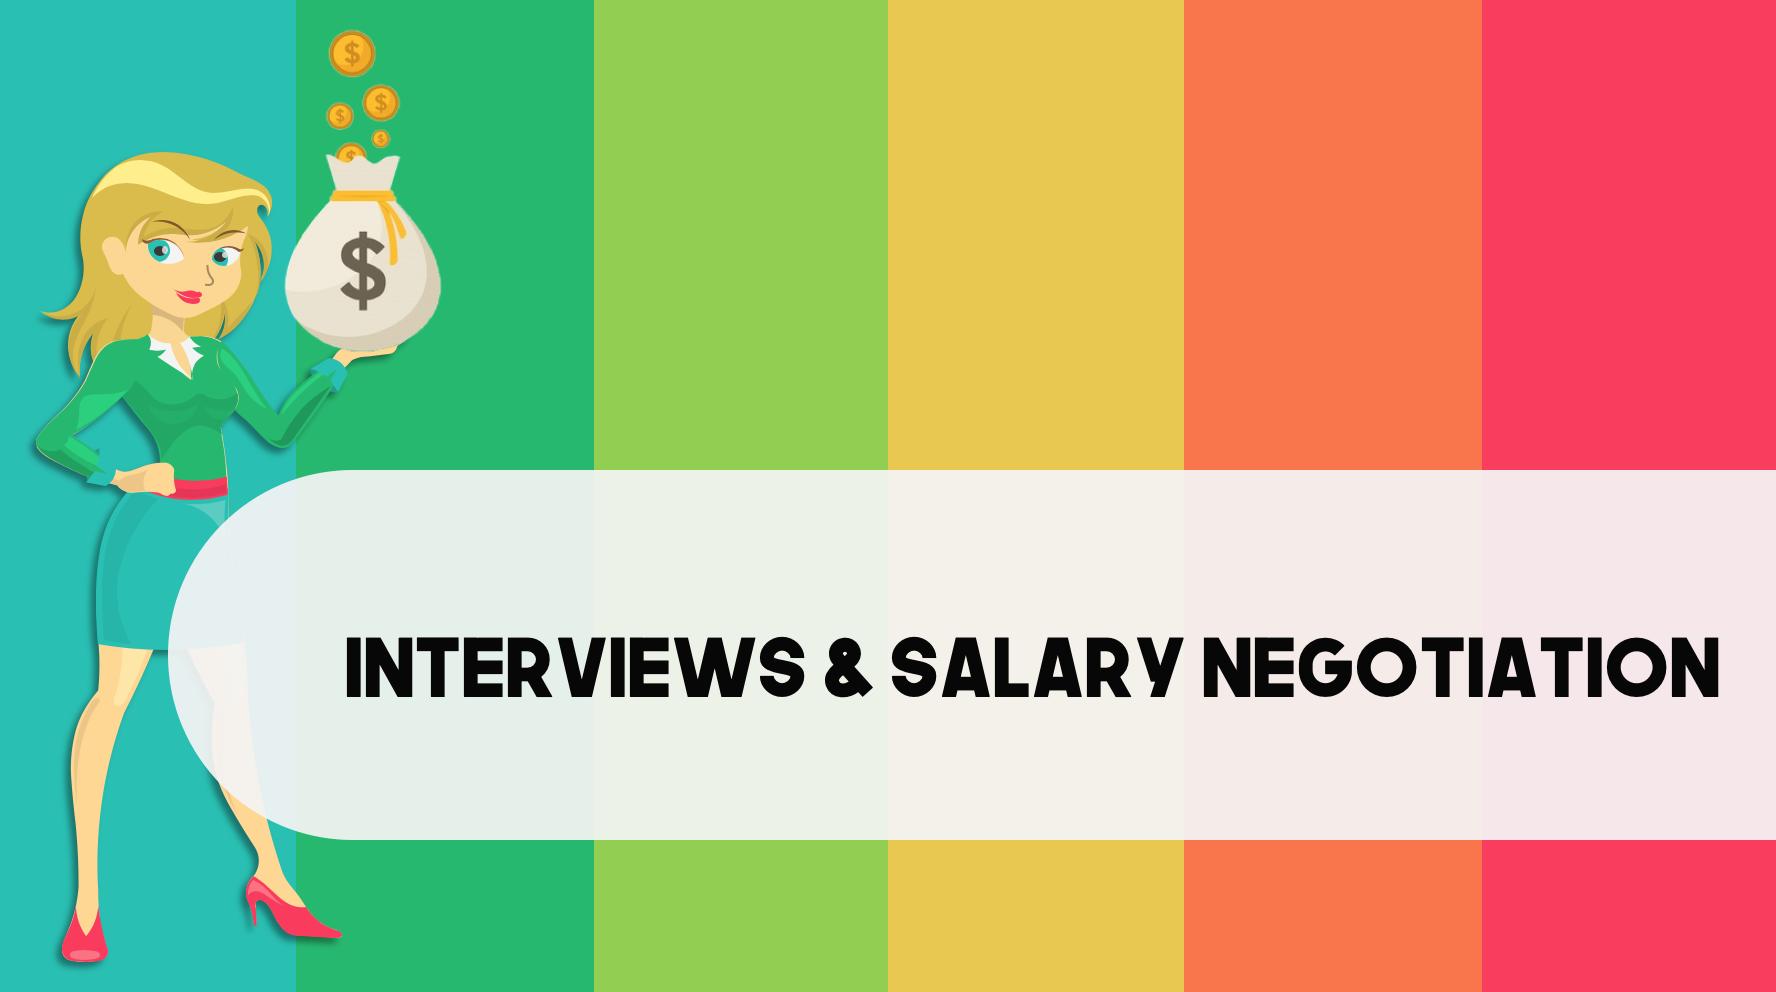 Interviews & Salary Negotiation